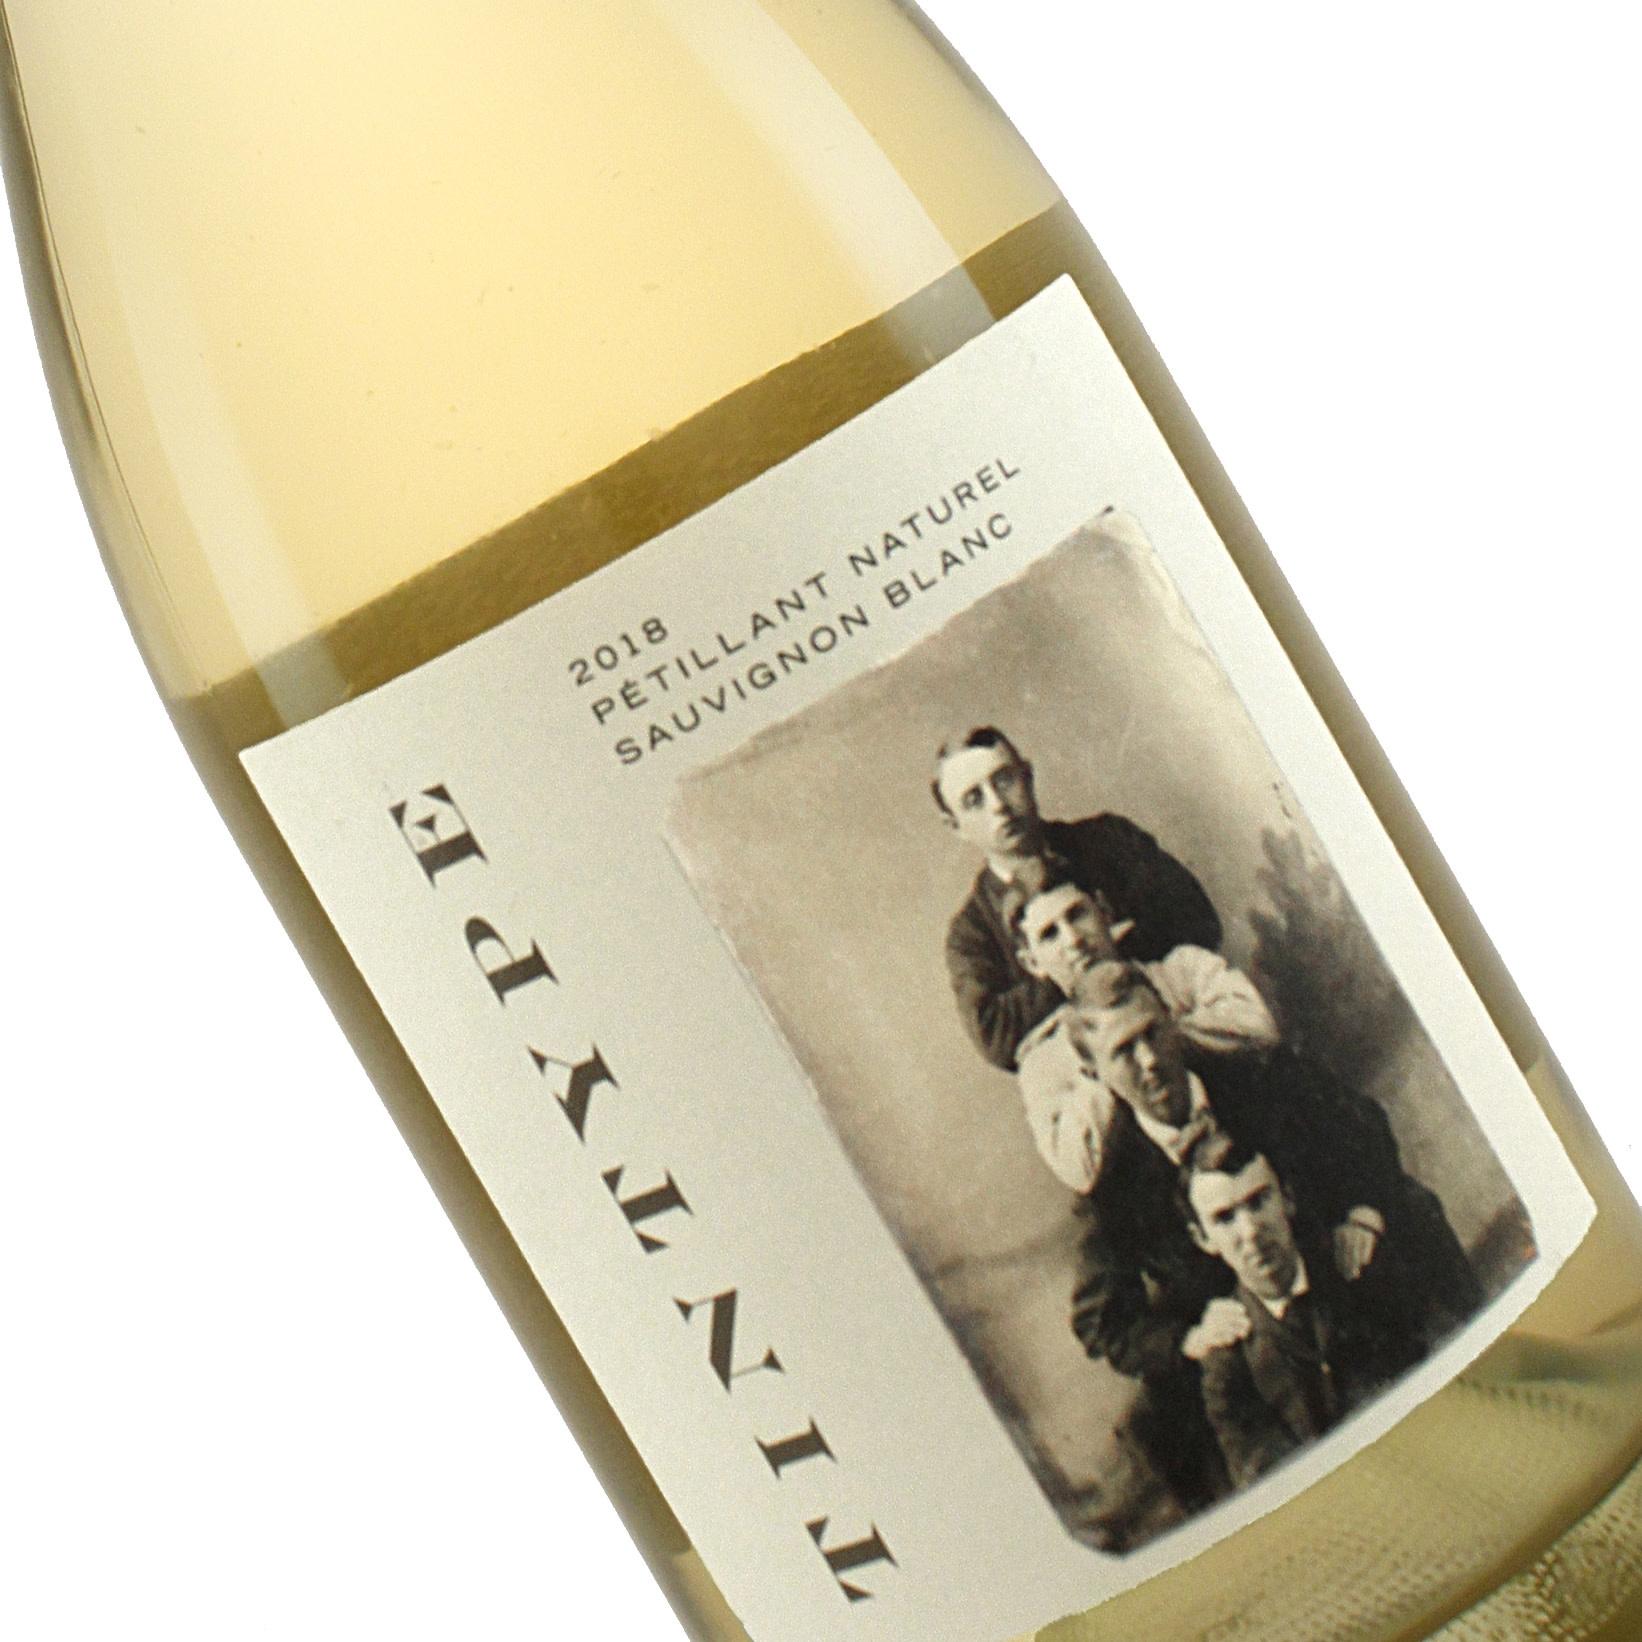 Tintype 2018 Sauvignon Blanc Petillant Naturel Vecino Vineyard, Mendocino County